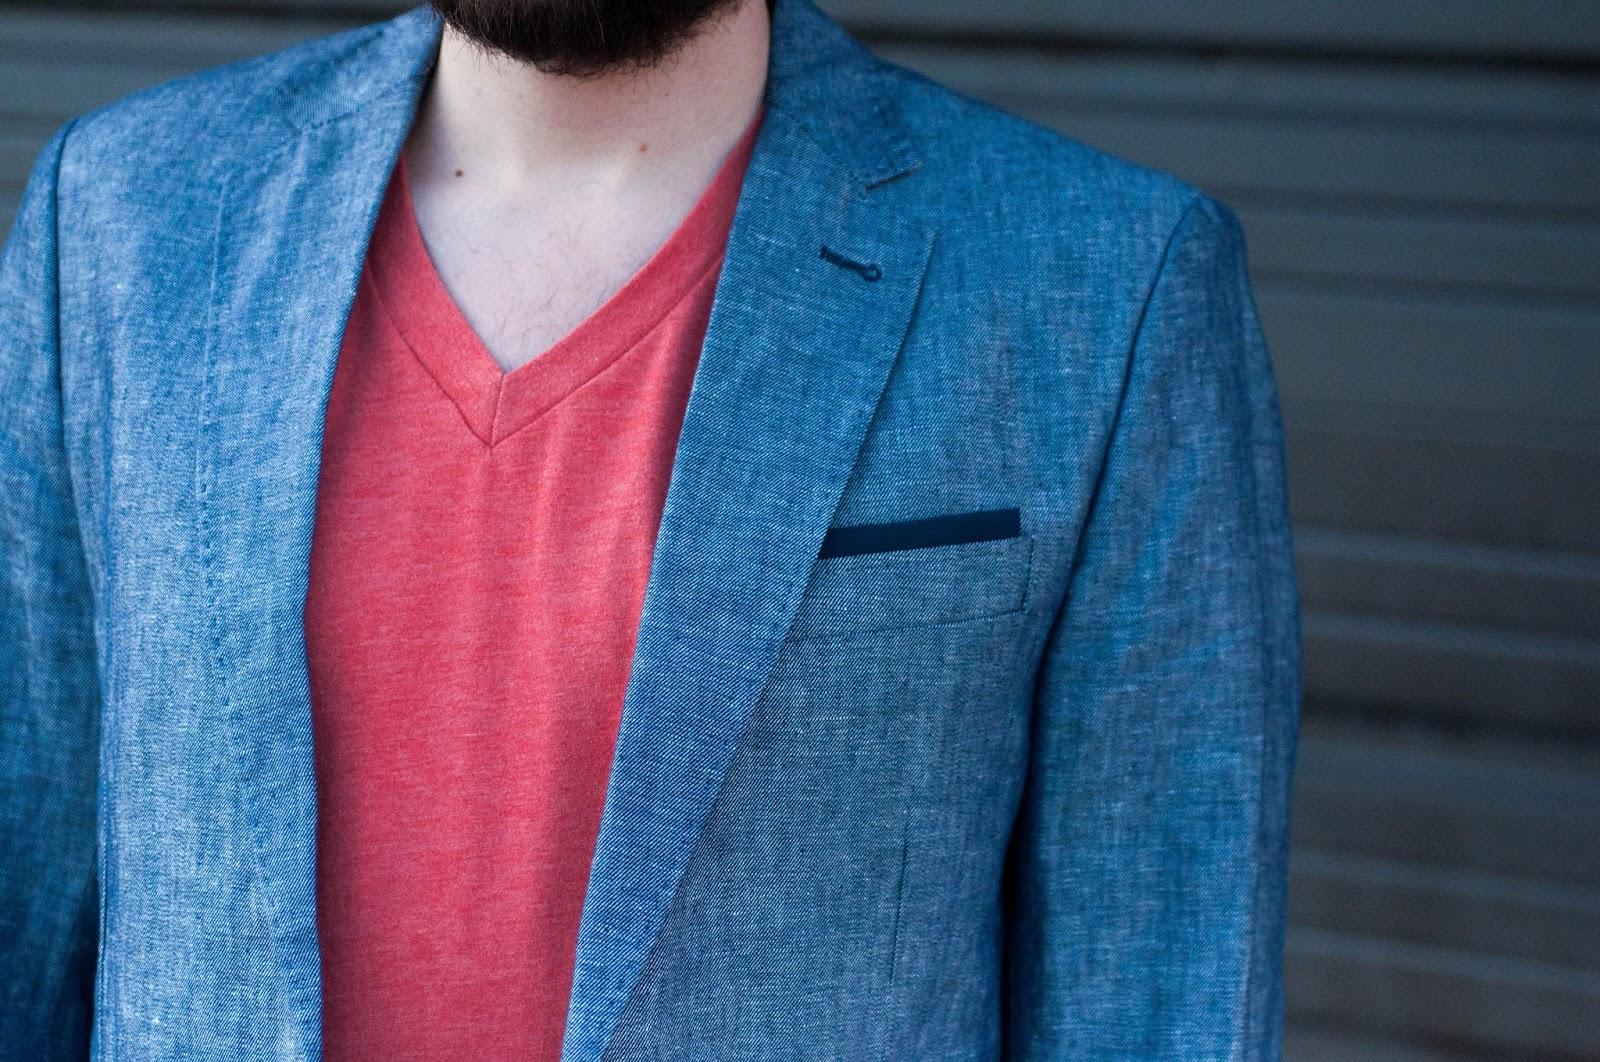 ootd, mens style, mens fashion blog, bdg tee, zara man, zara blazer